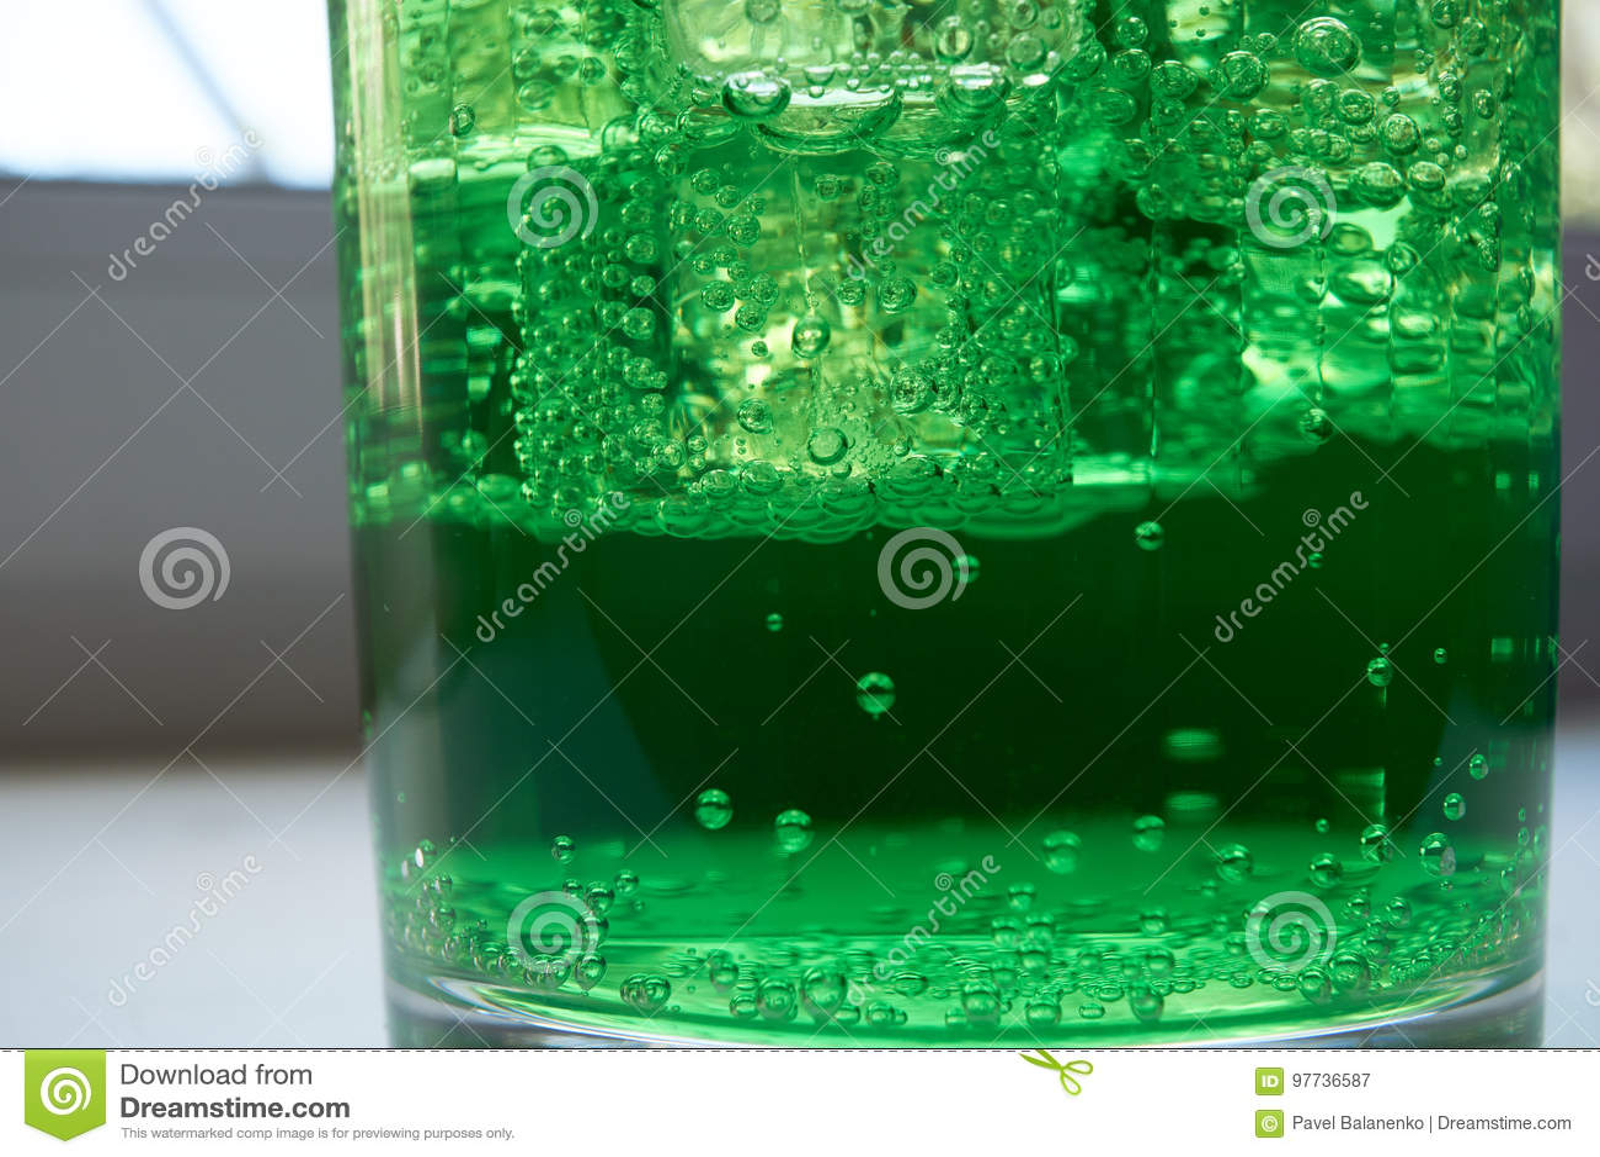 Tiro del primer de un agua aireada verde